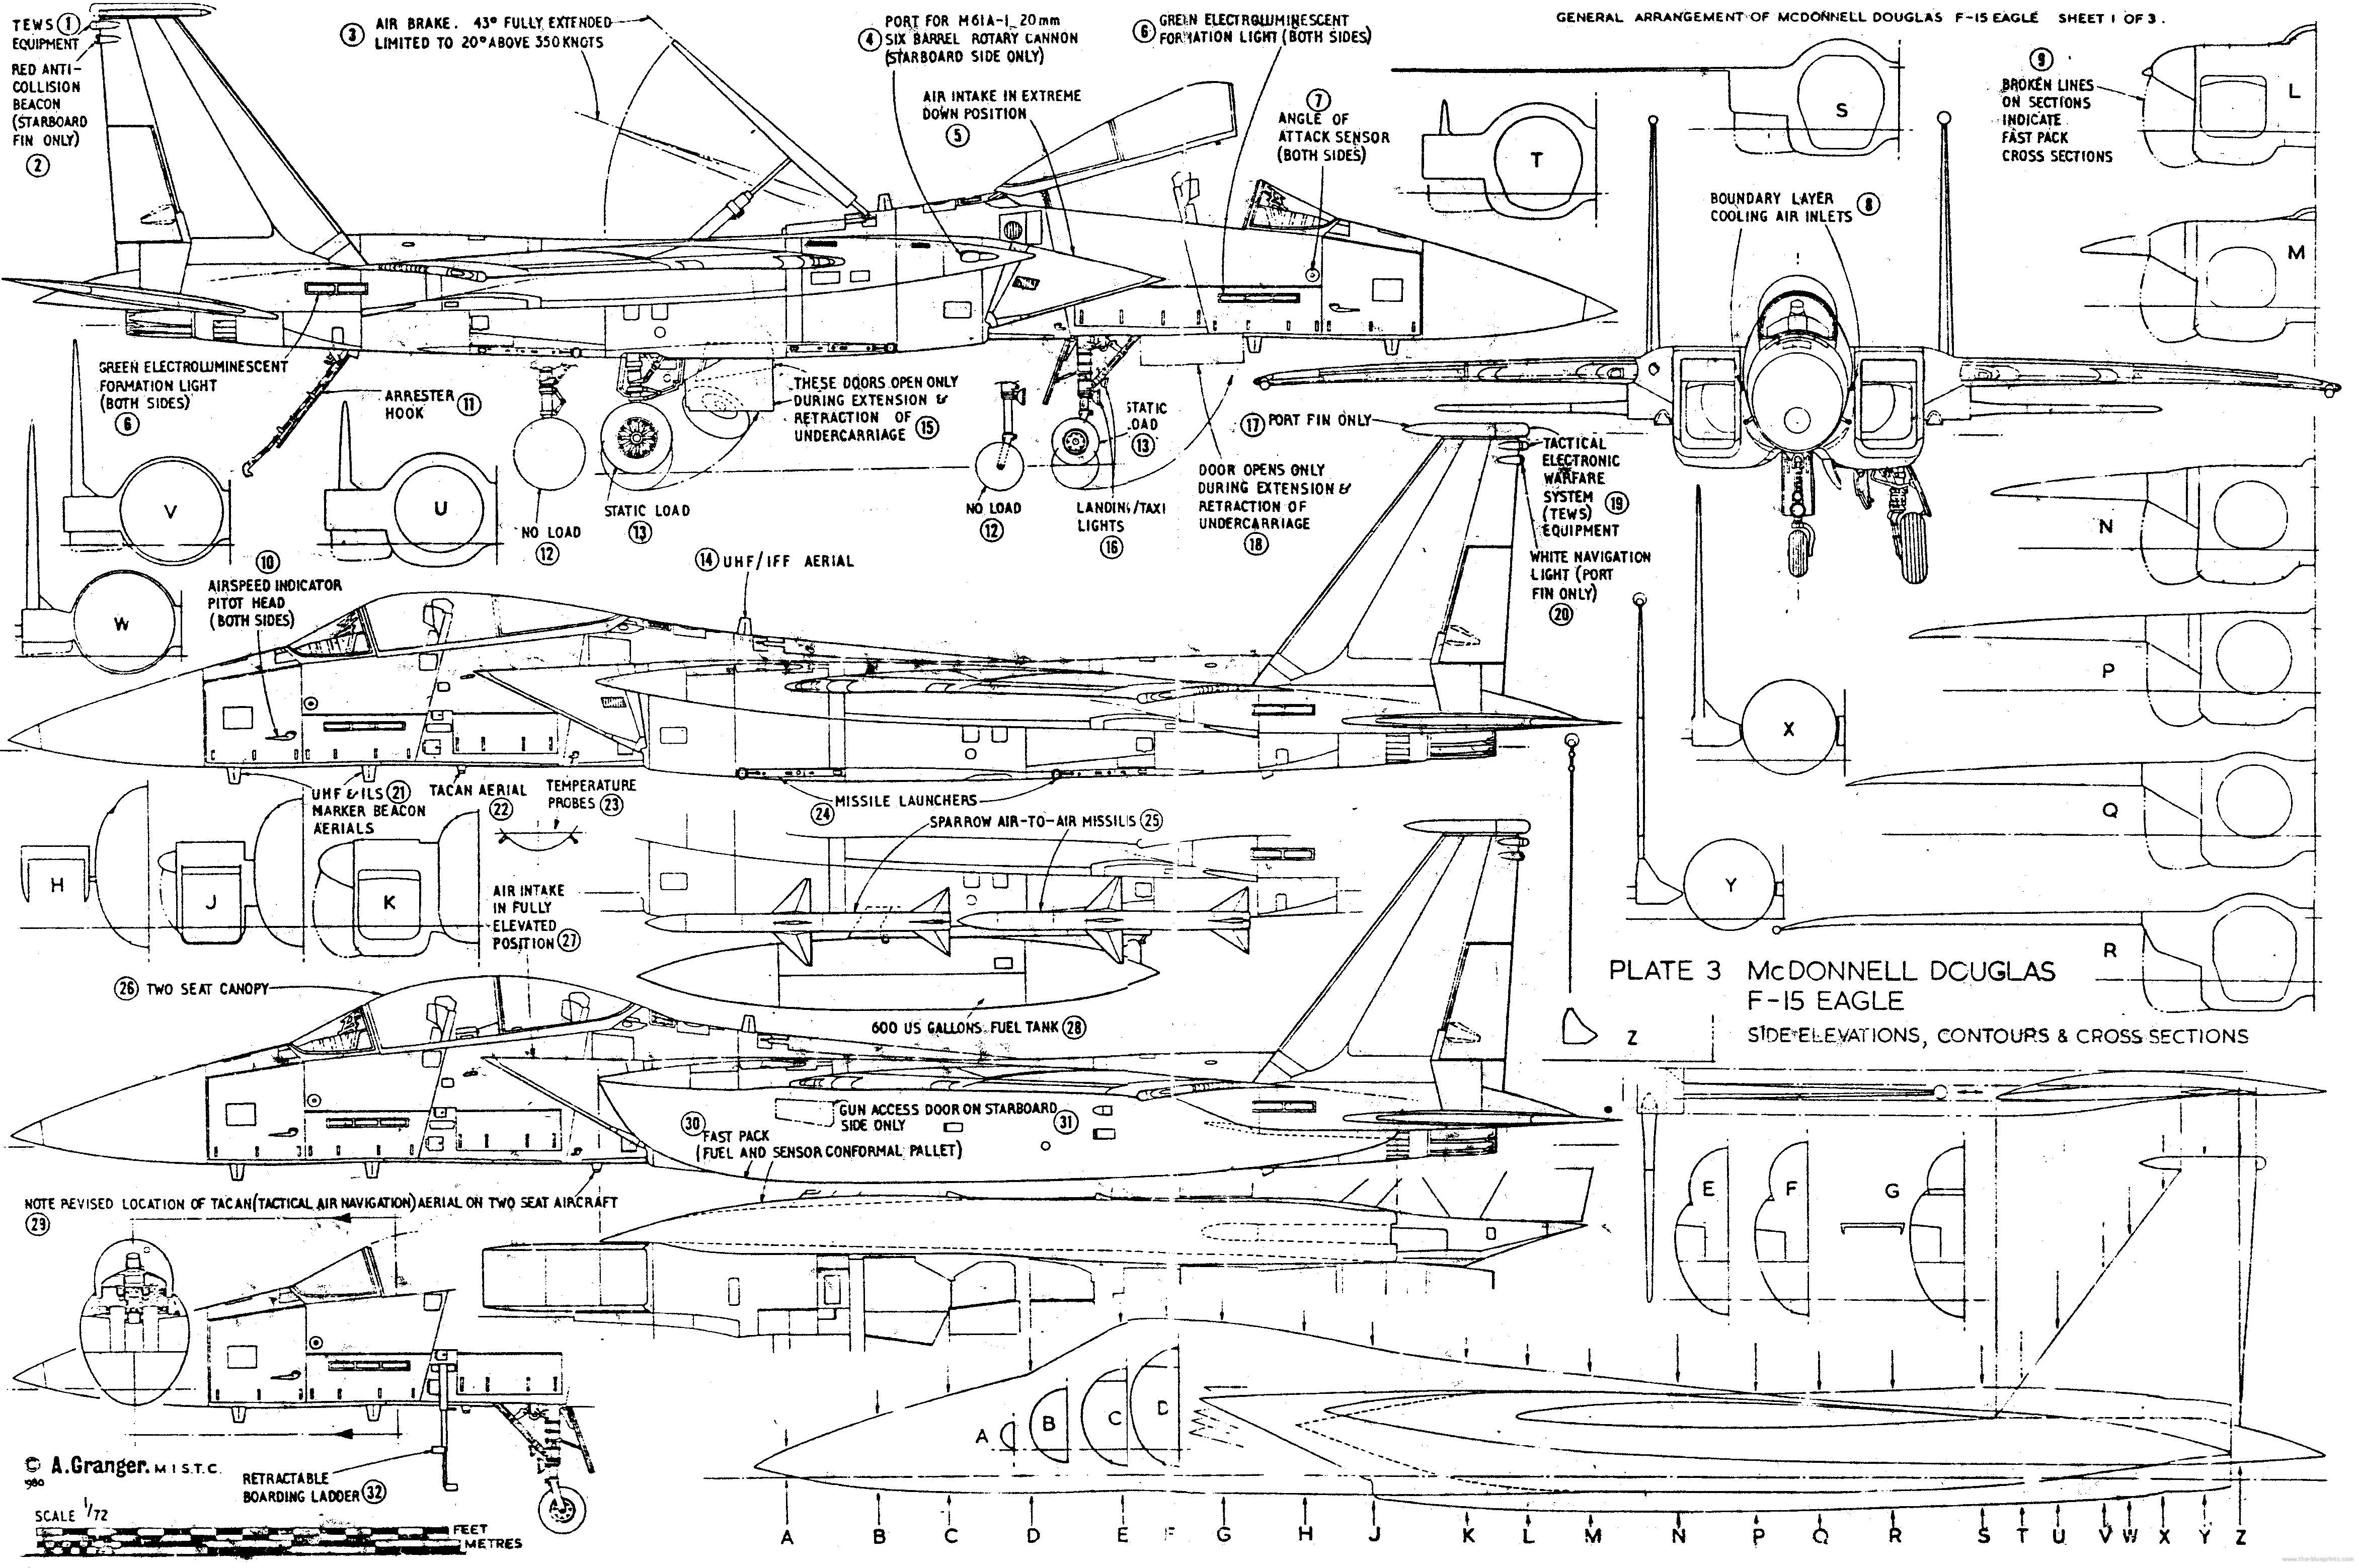 F 22 Raptor Schematics Trusted Wiring Diagrams Engine Diagram 3 View Schematic Auto Electrical U2022